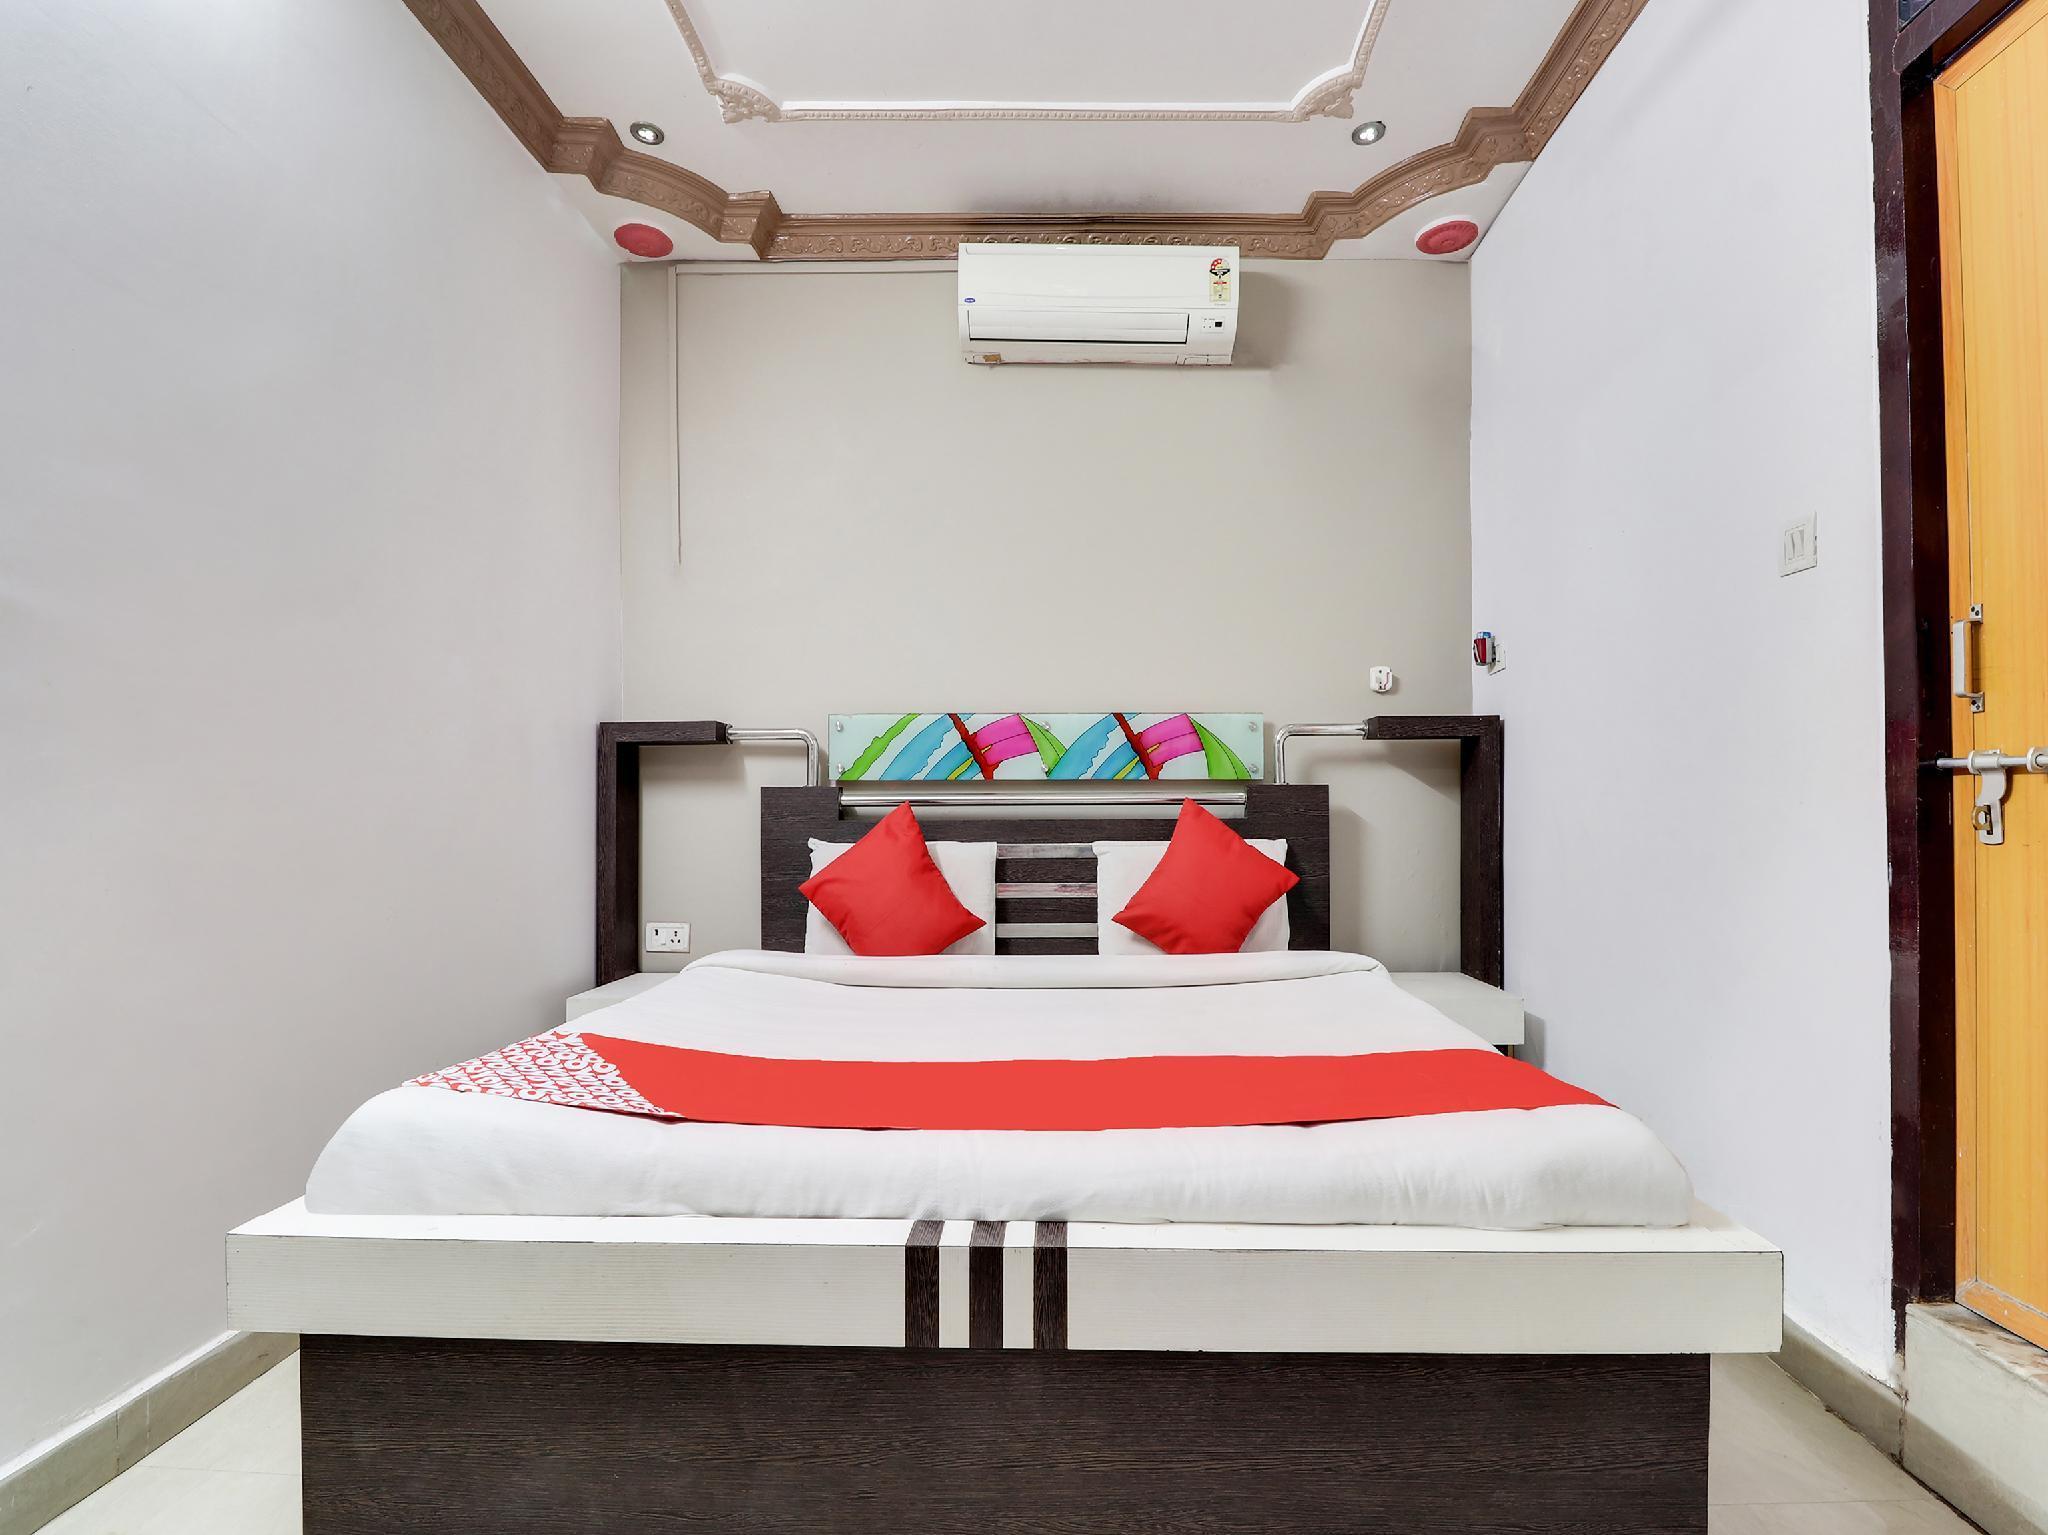 OYO 37404 Hotel Residence Inn